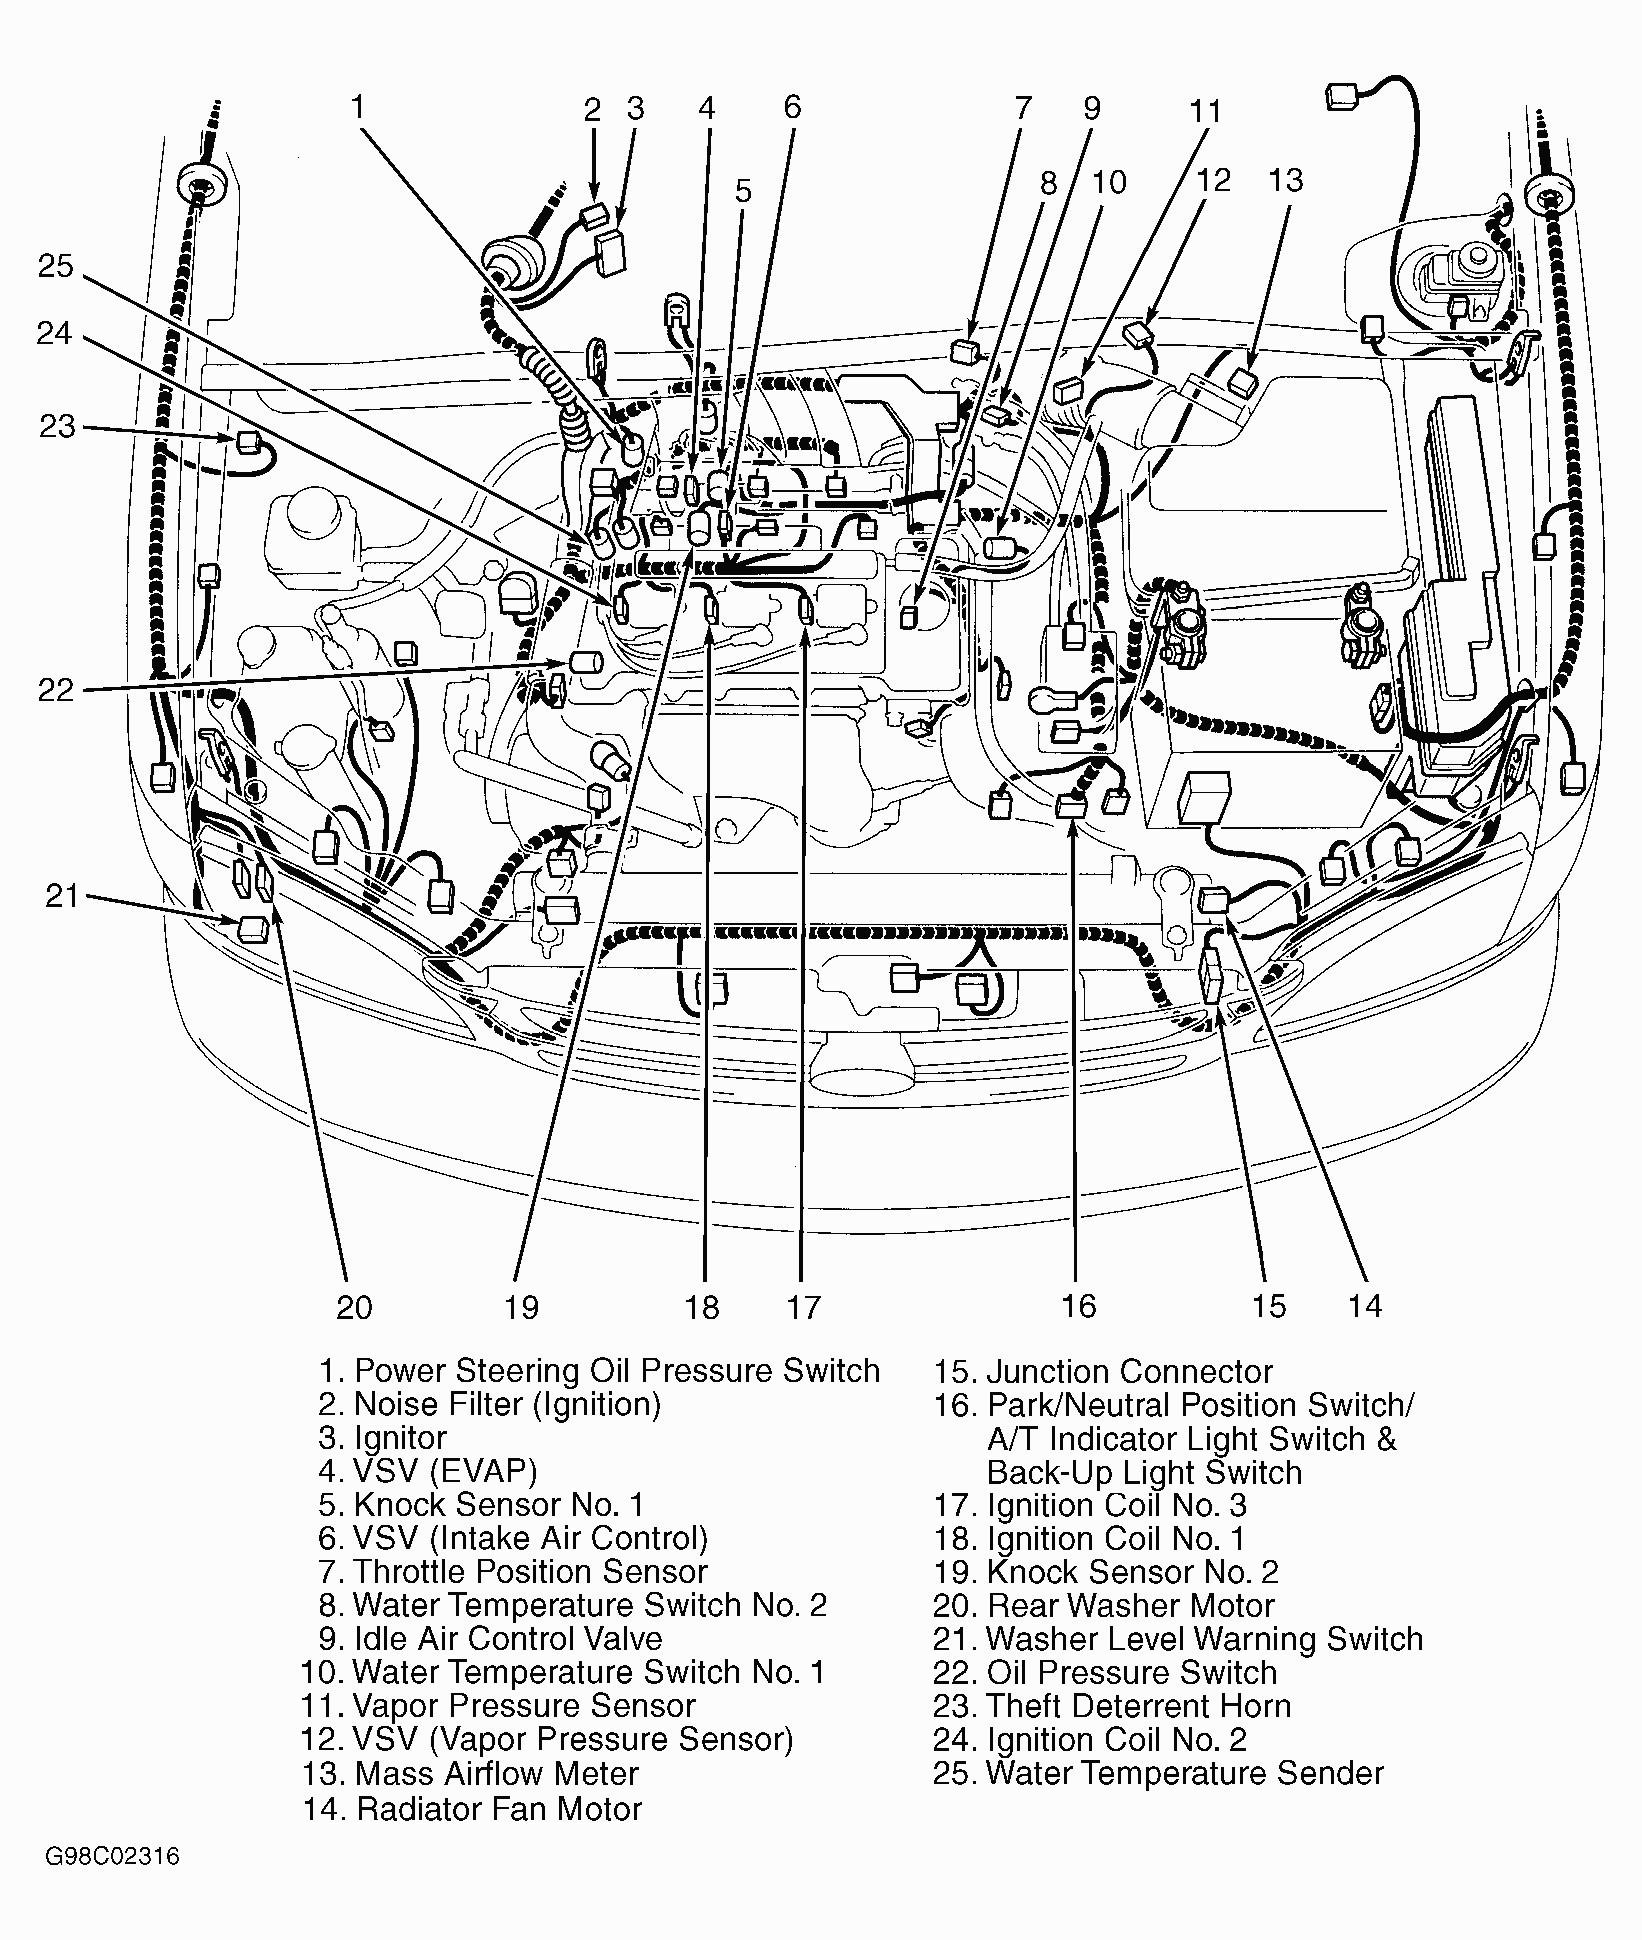 94 toyota Corolla Engine Diagram toyota Engine Schematics Wiring Diagram Paper